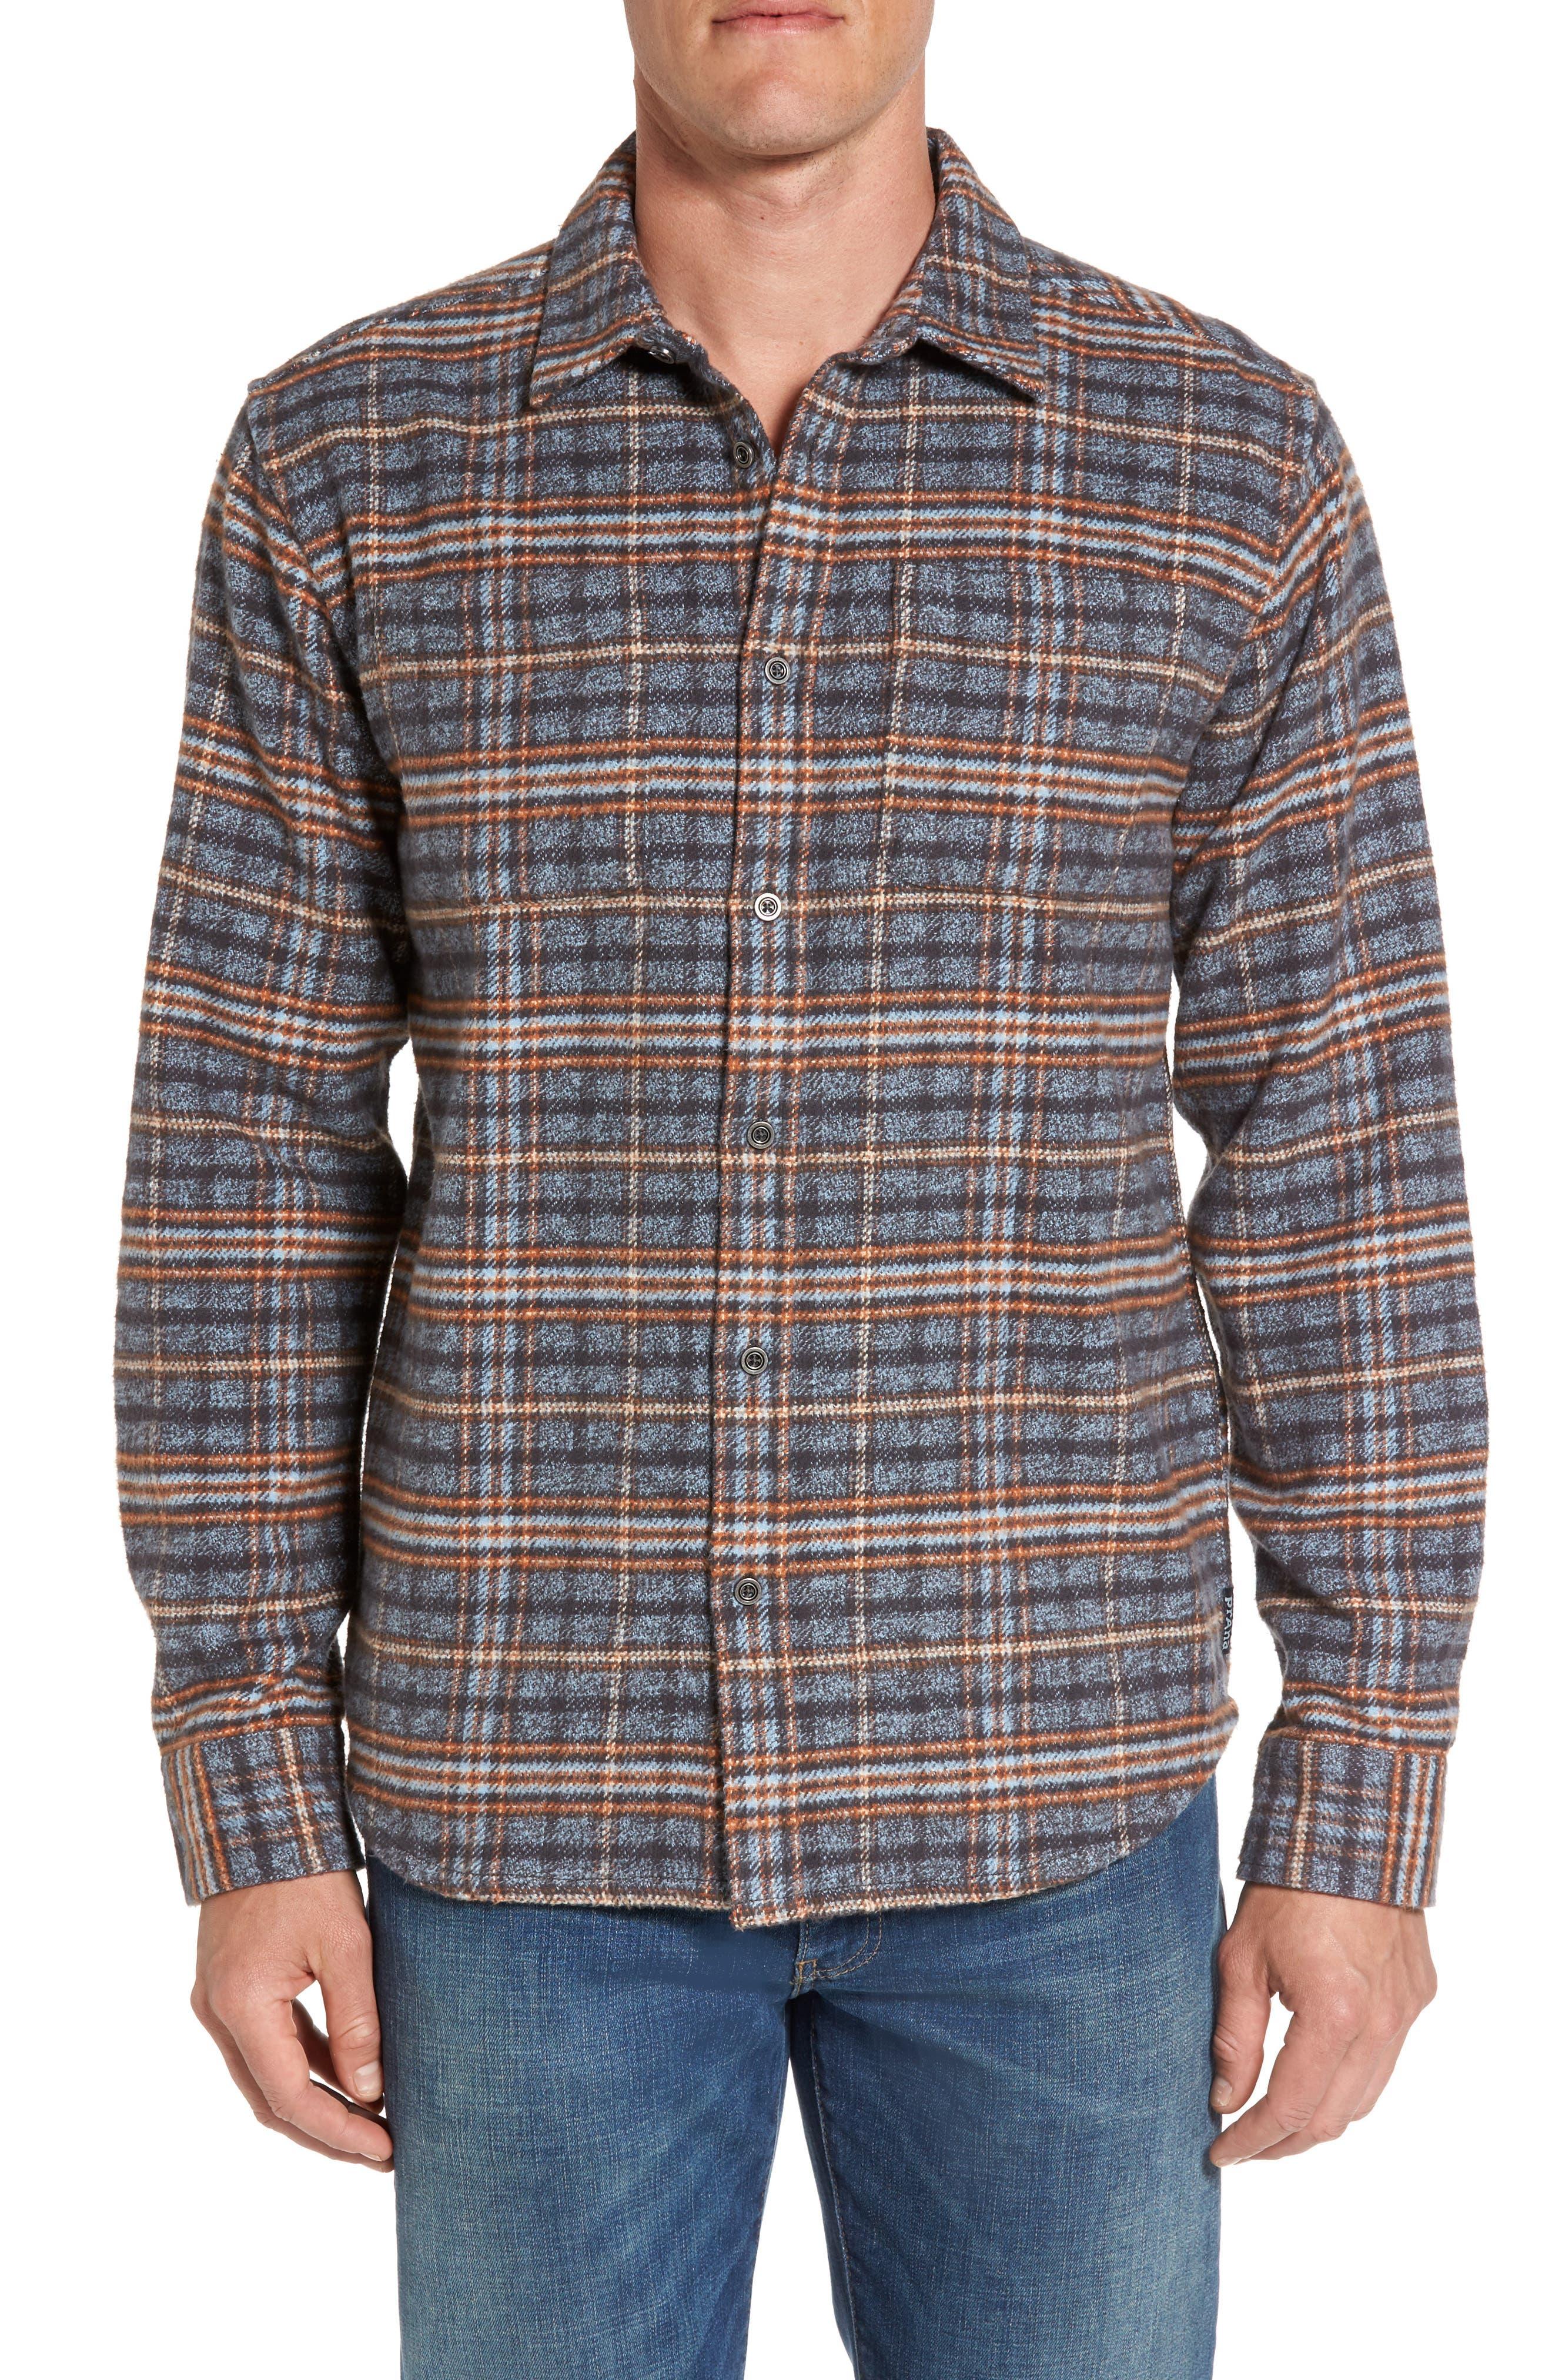 Brayden Regular Fit Plaid Flannel Shirt,                             Main thumbnail 1, color,